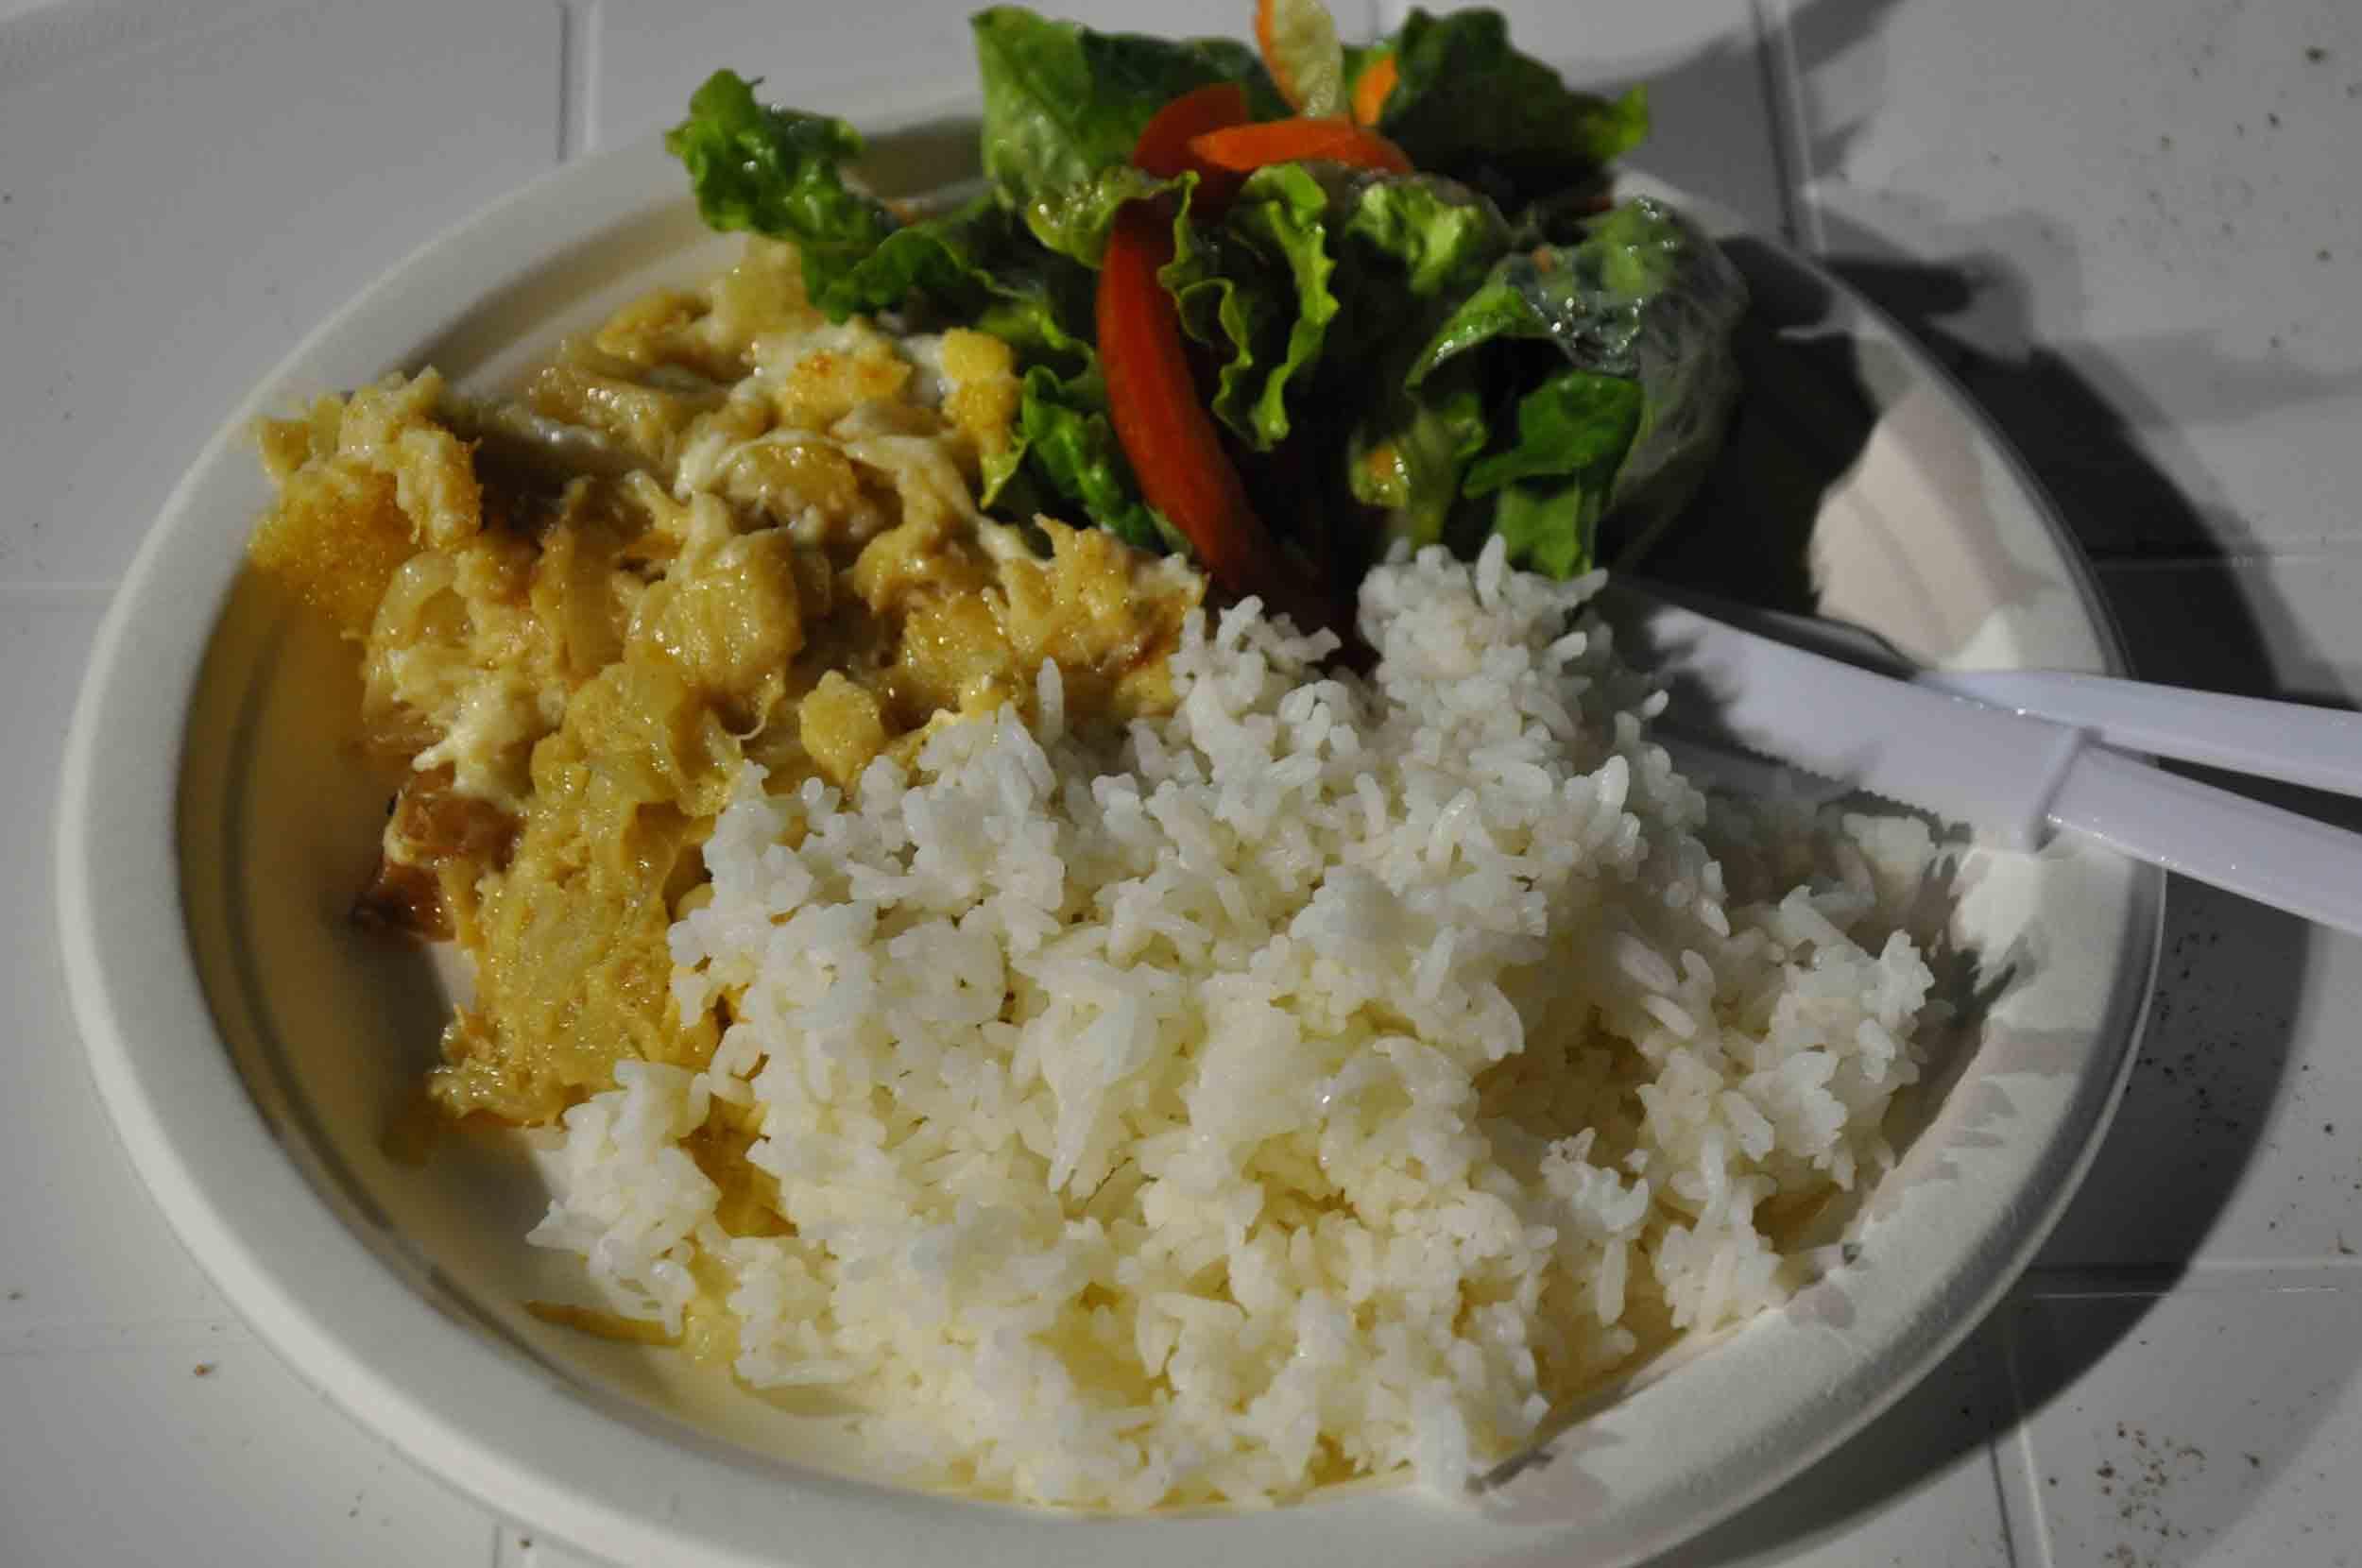 Lusofonia Festival Codfish with Cream